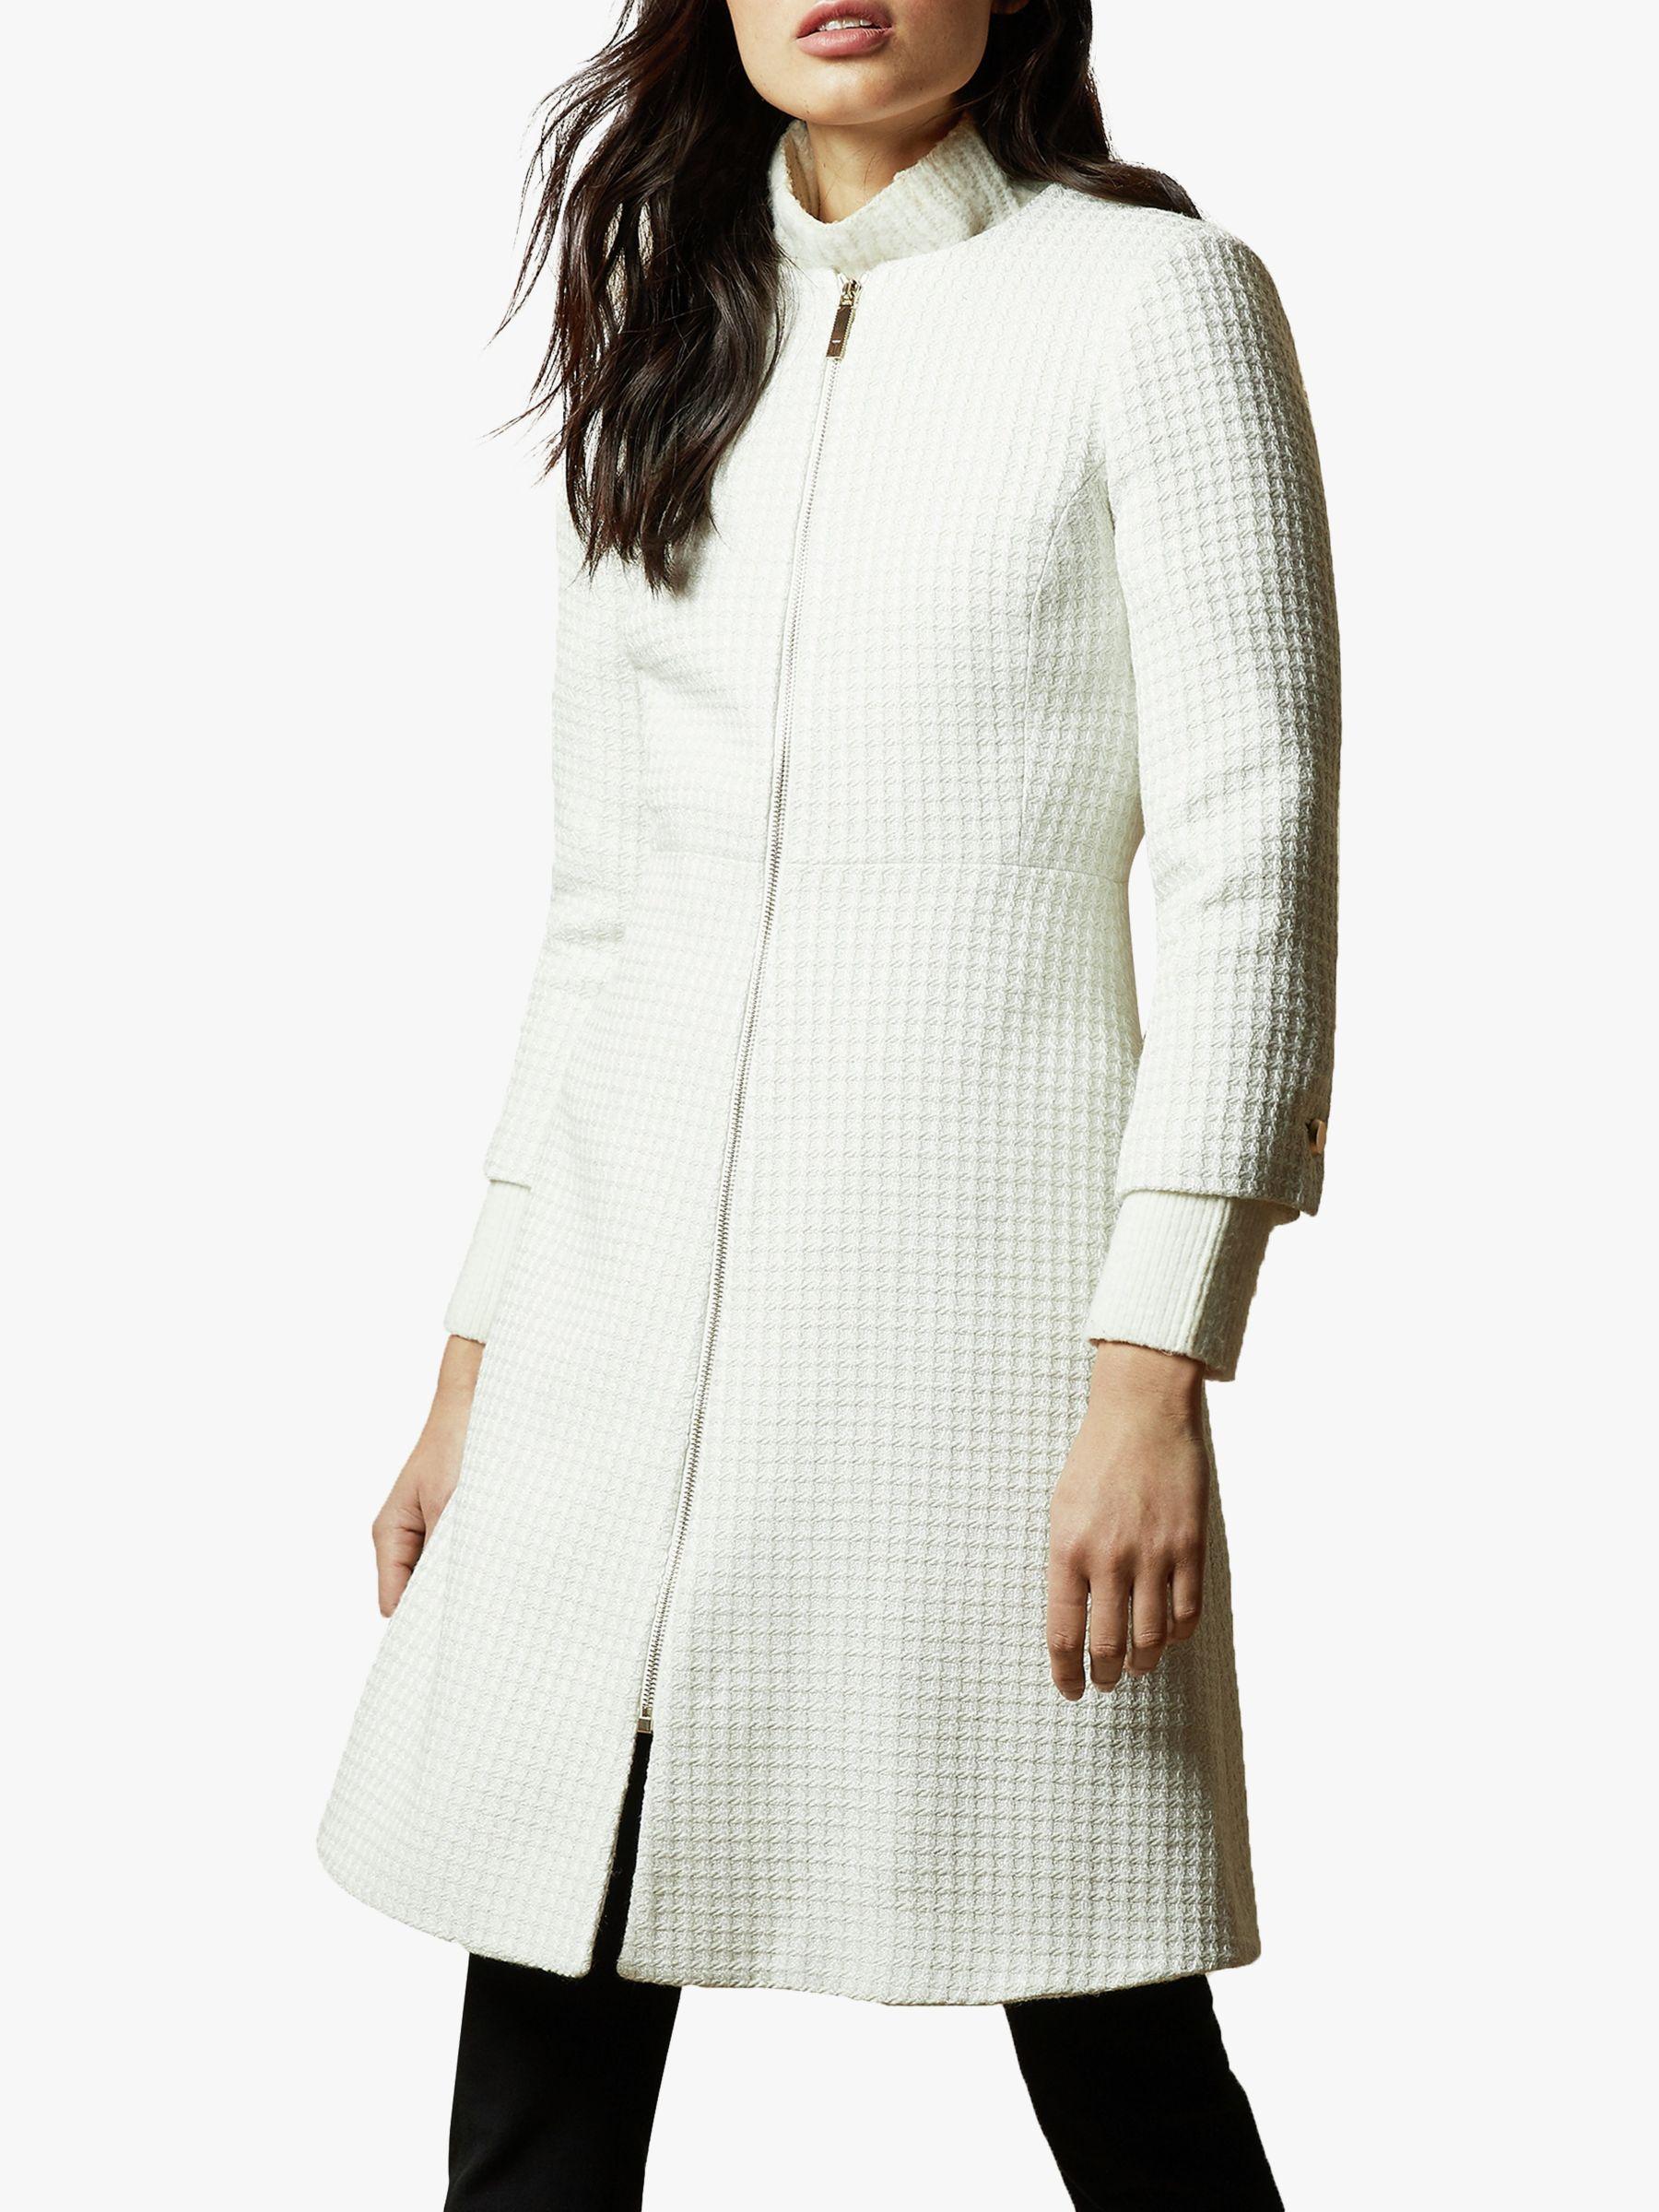 Ted Baker Ted Baker Accra Textured Dress Coat, White